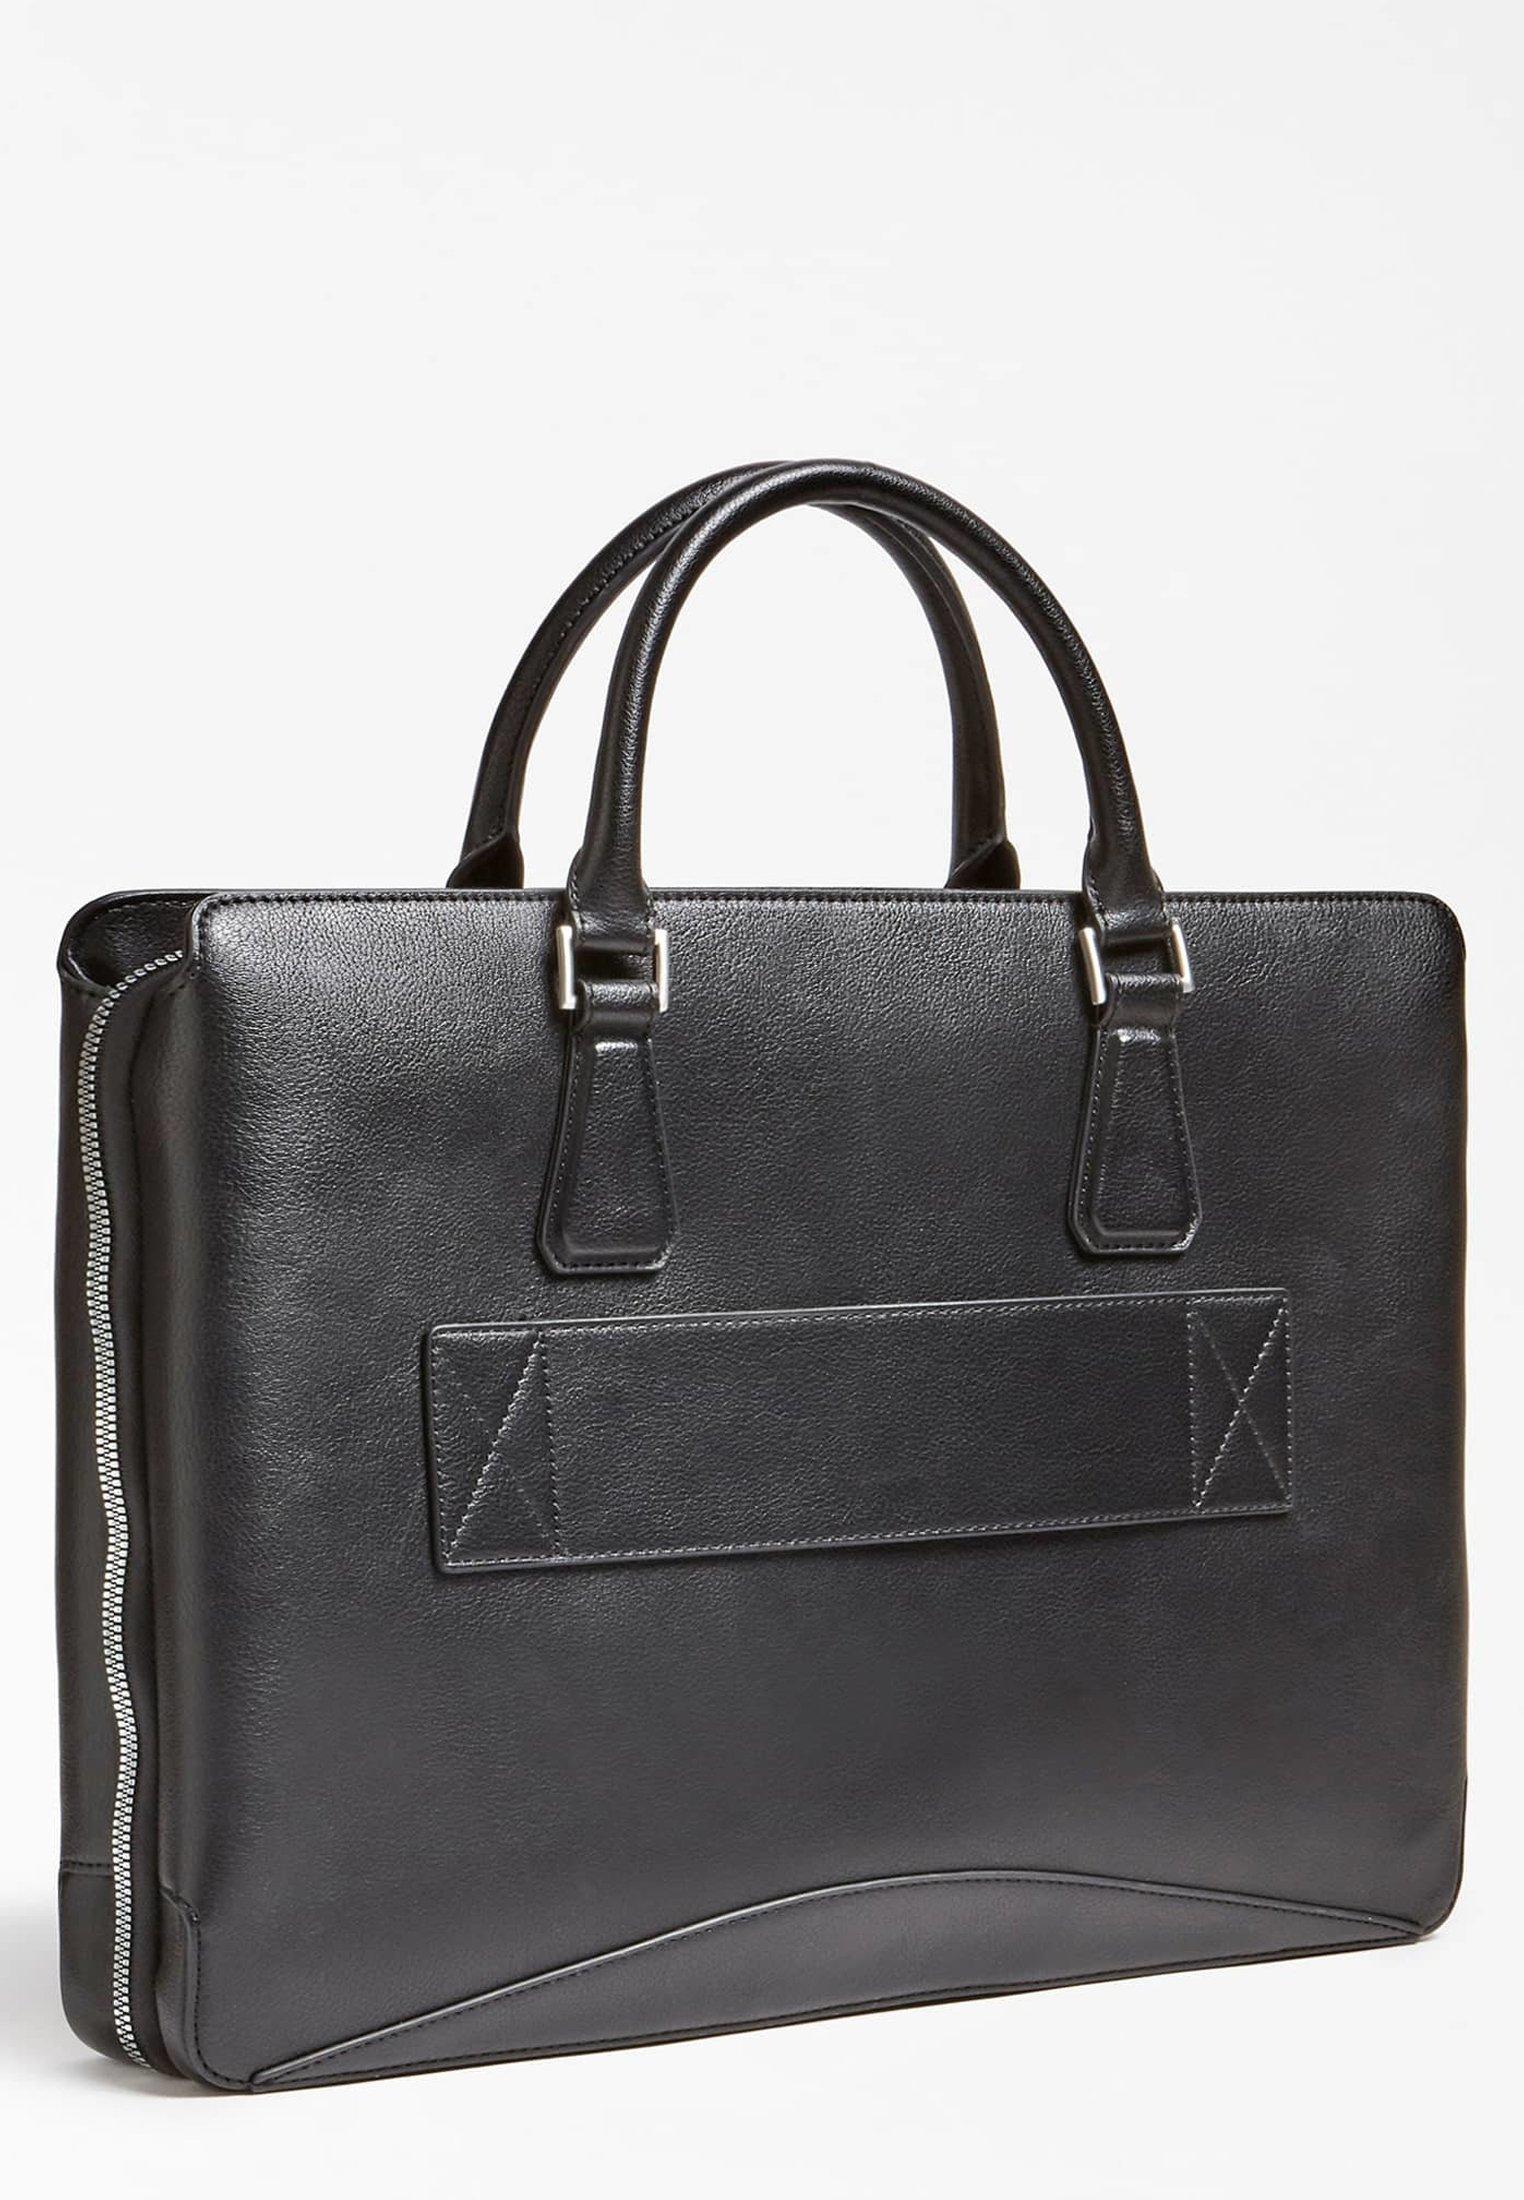 Guess Notebooktasche - schwarz - Herrentaschen tMGPL